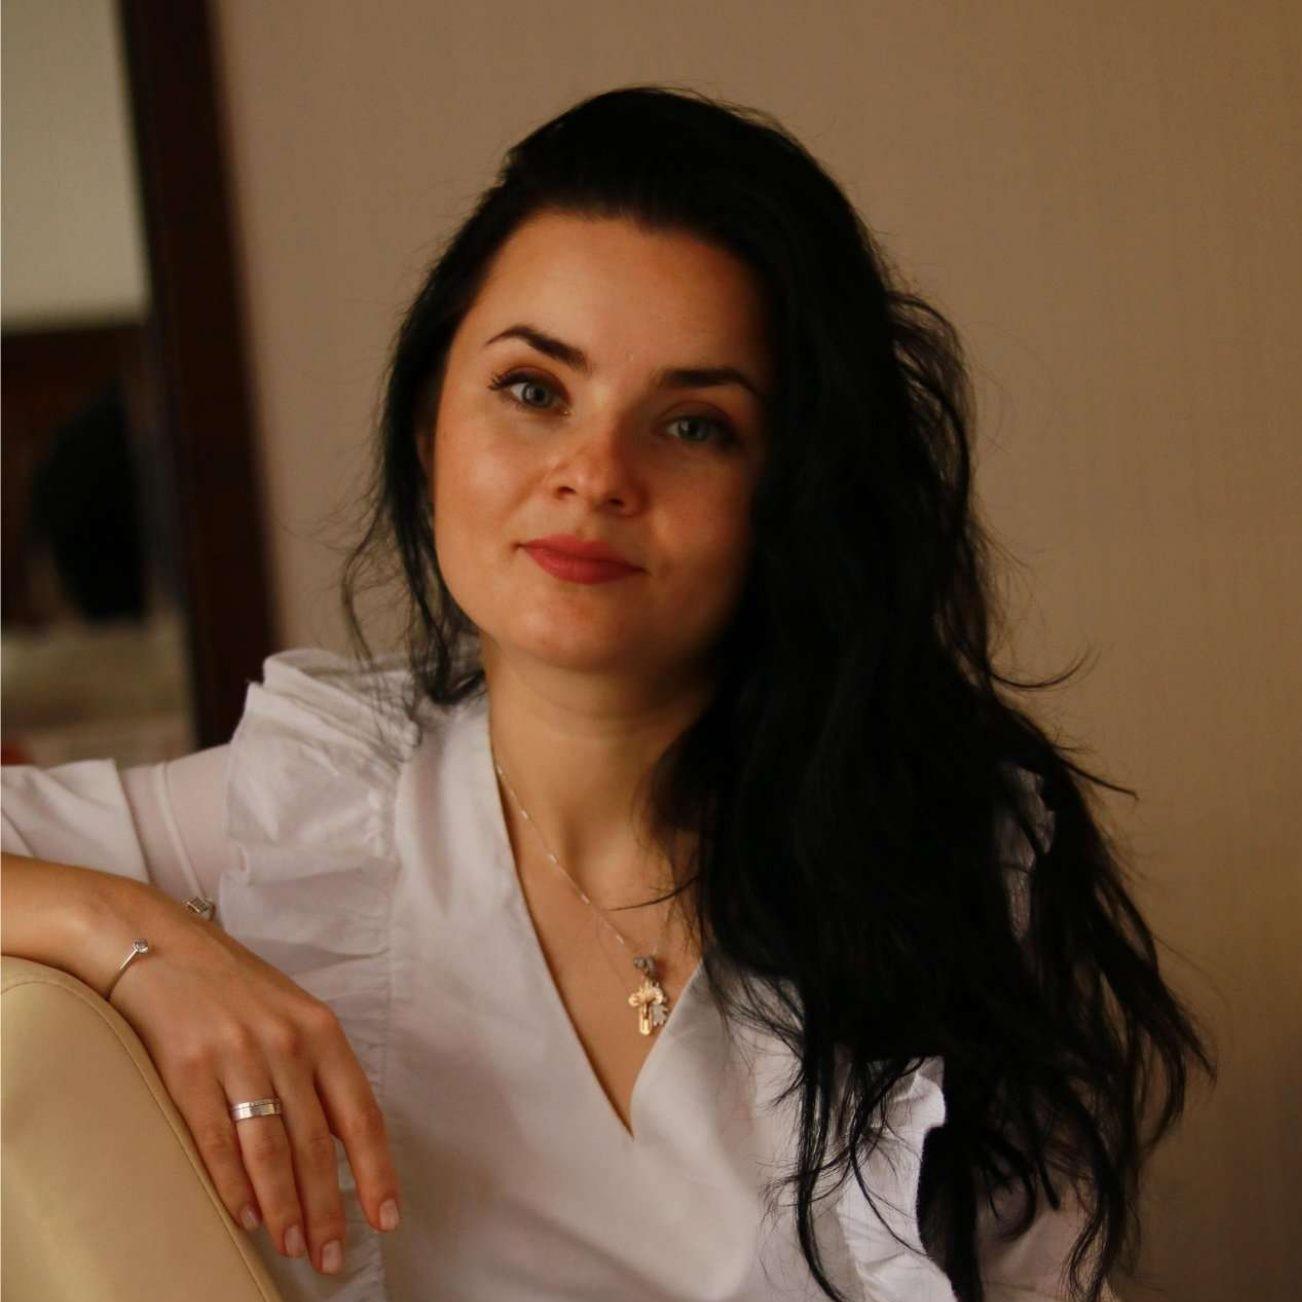 Милослава Журавльова